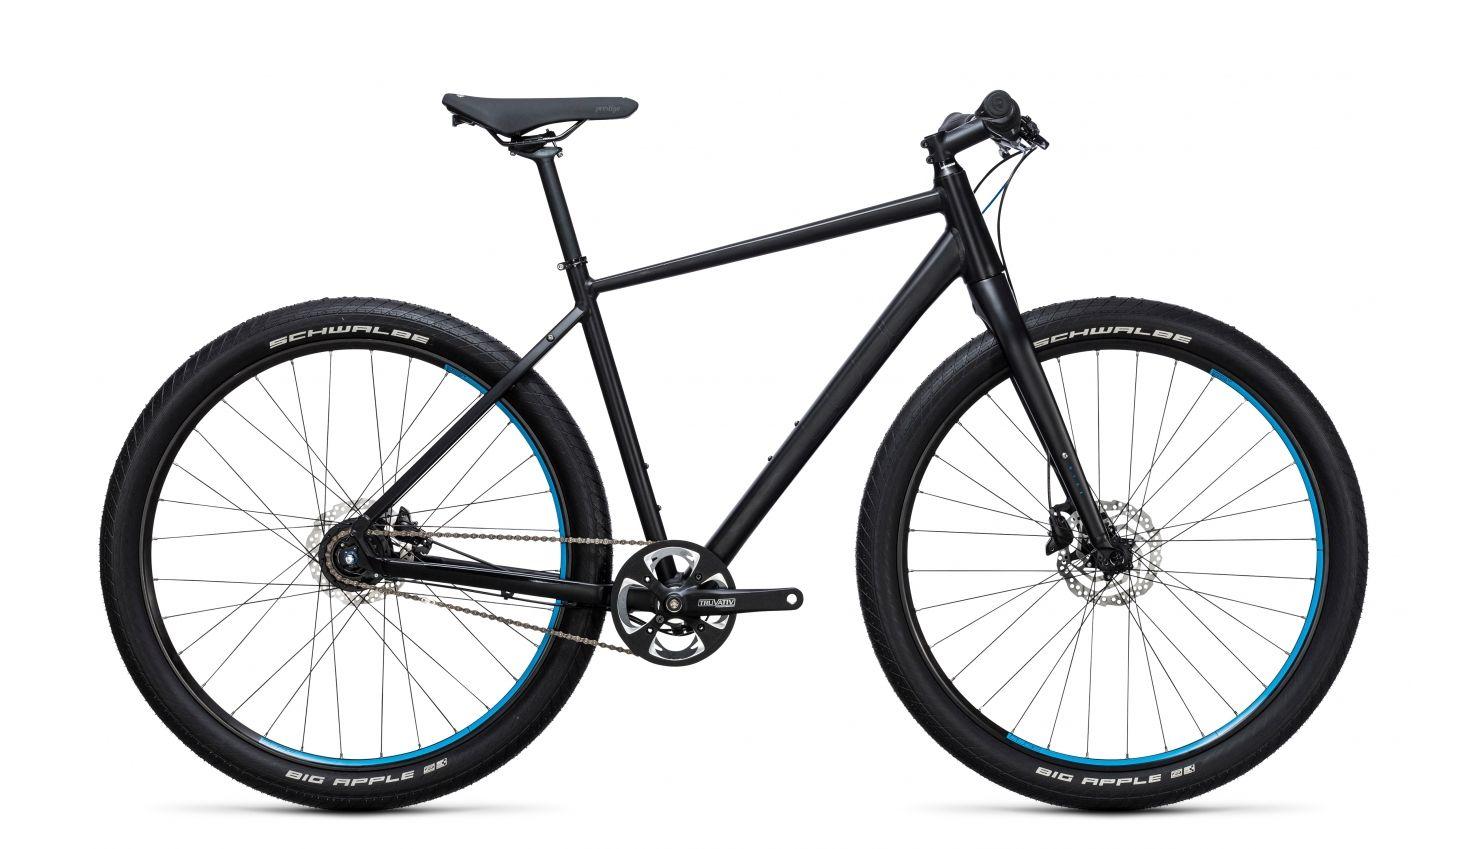 Cube Hyde Pro Black N Blue Gunstig Kaufen Fahrrad De Burley Trailer Bike Bike Rental